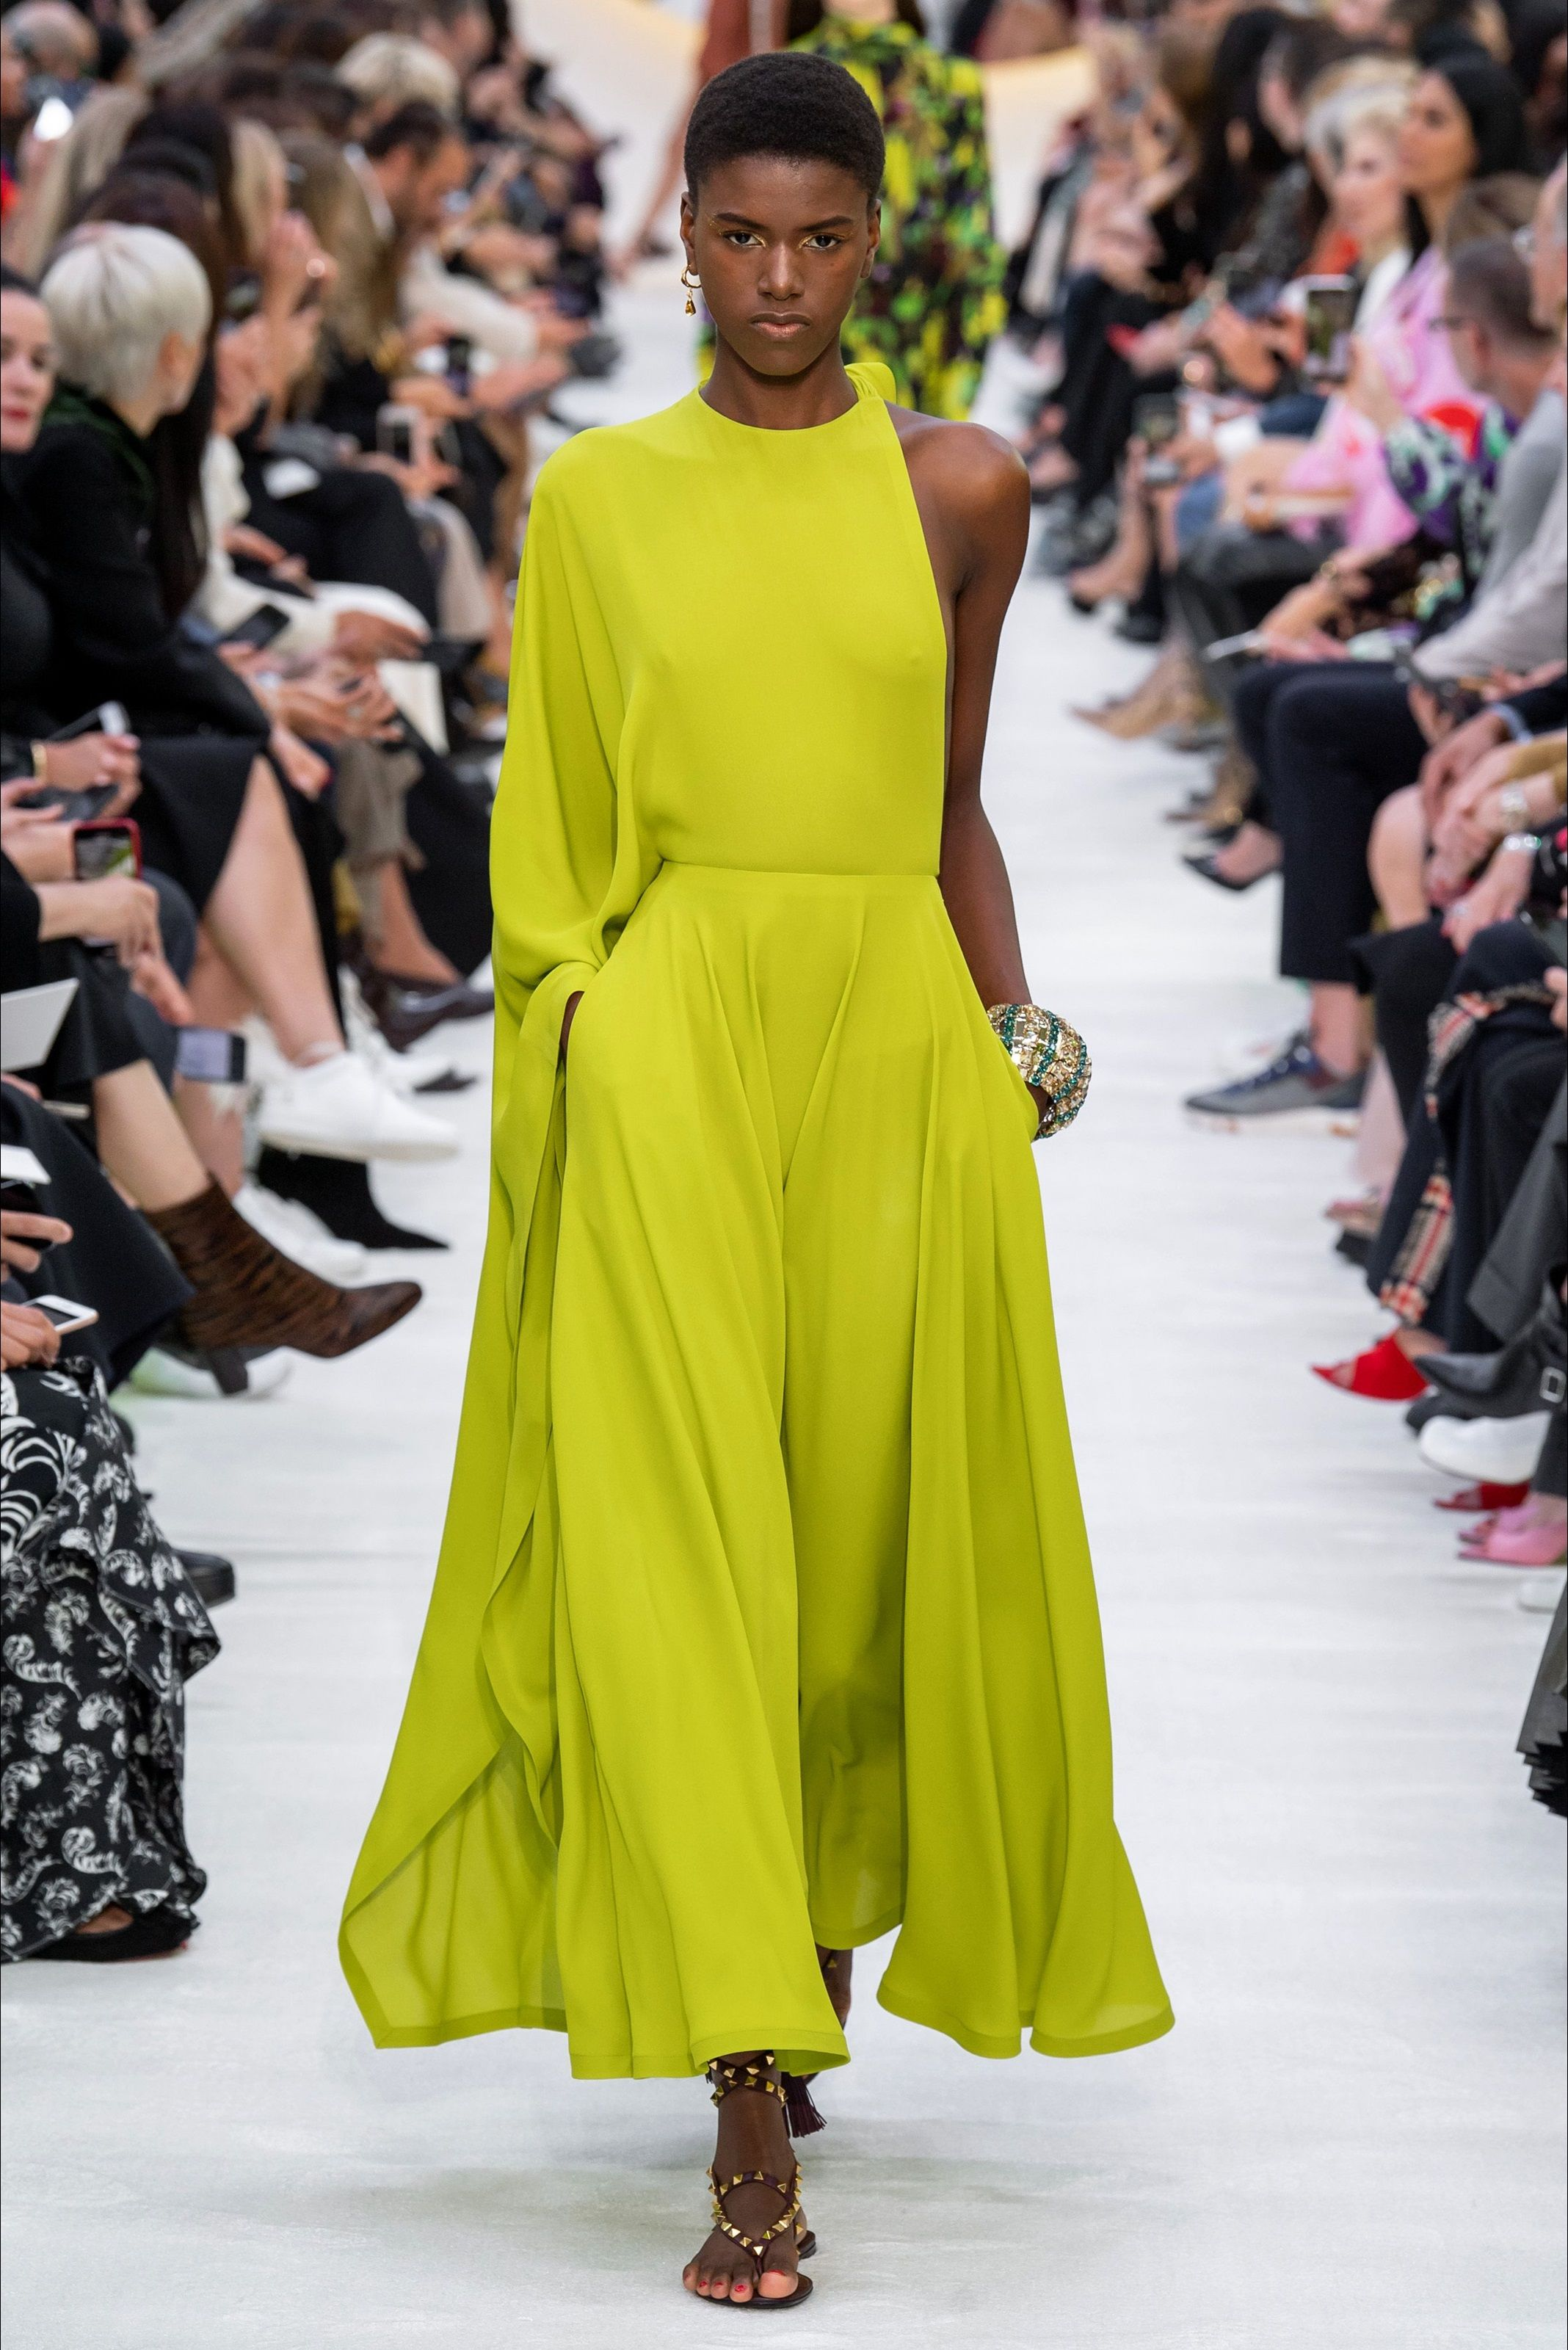 Vestiti Eleganti Valentino.Sfilata Valentino Parigi Collezioni Primavera Estate 2020